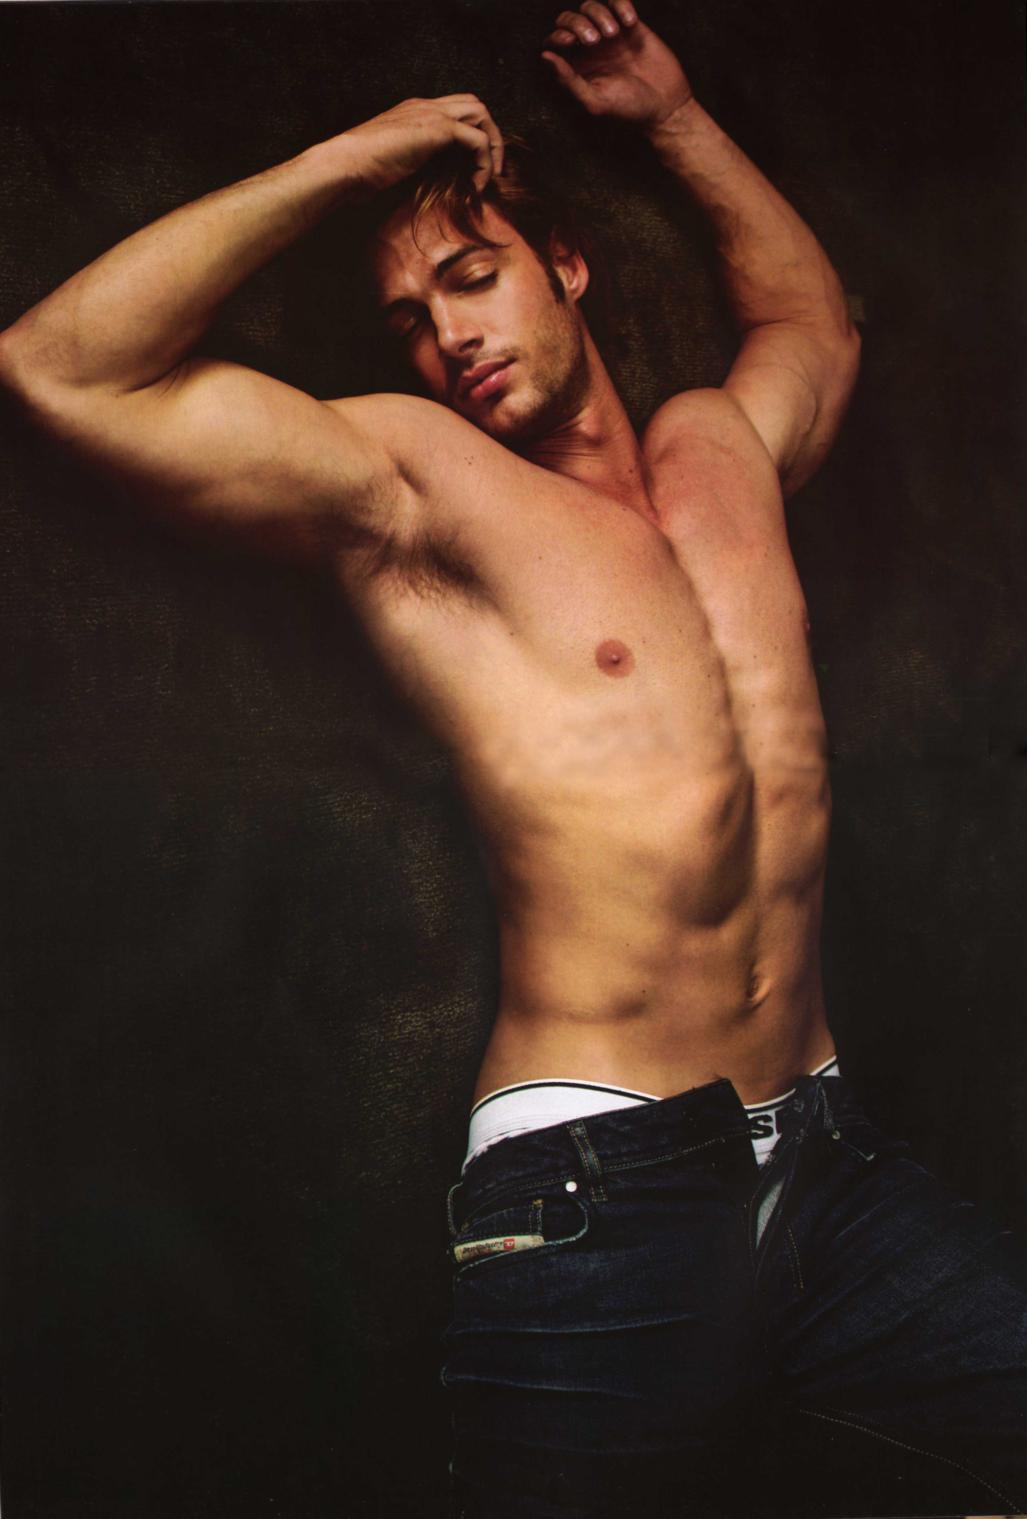 imagenes de modelos hombres sin ropa interior - consejos para ser un modelo masculino Facebook